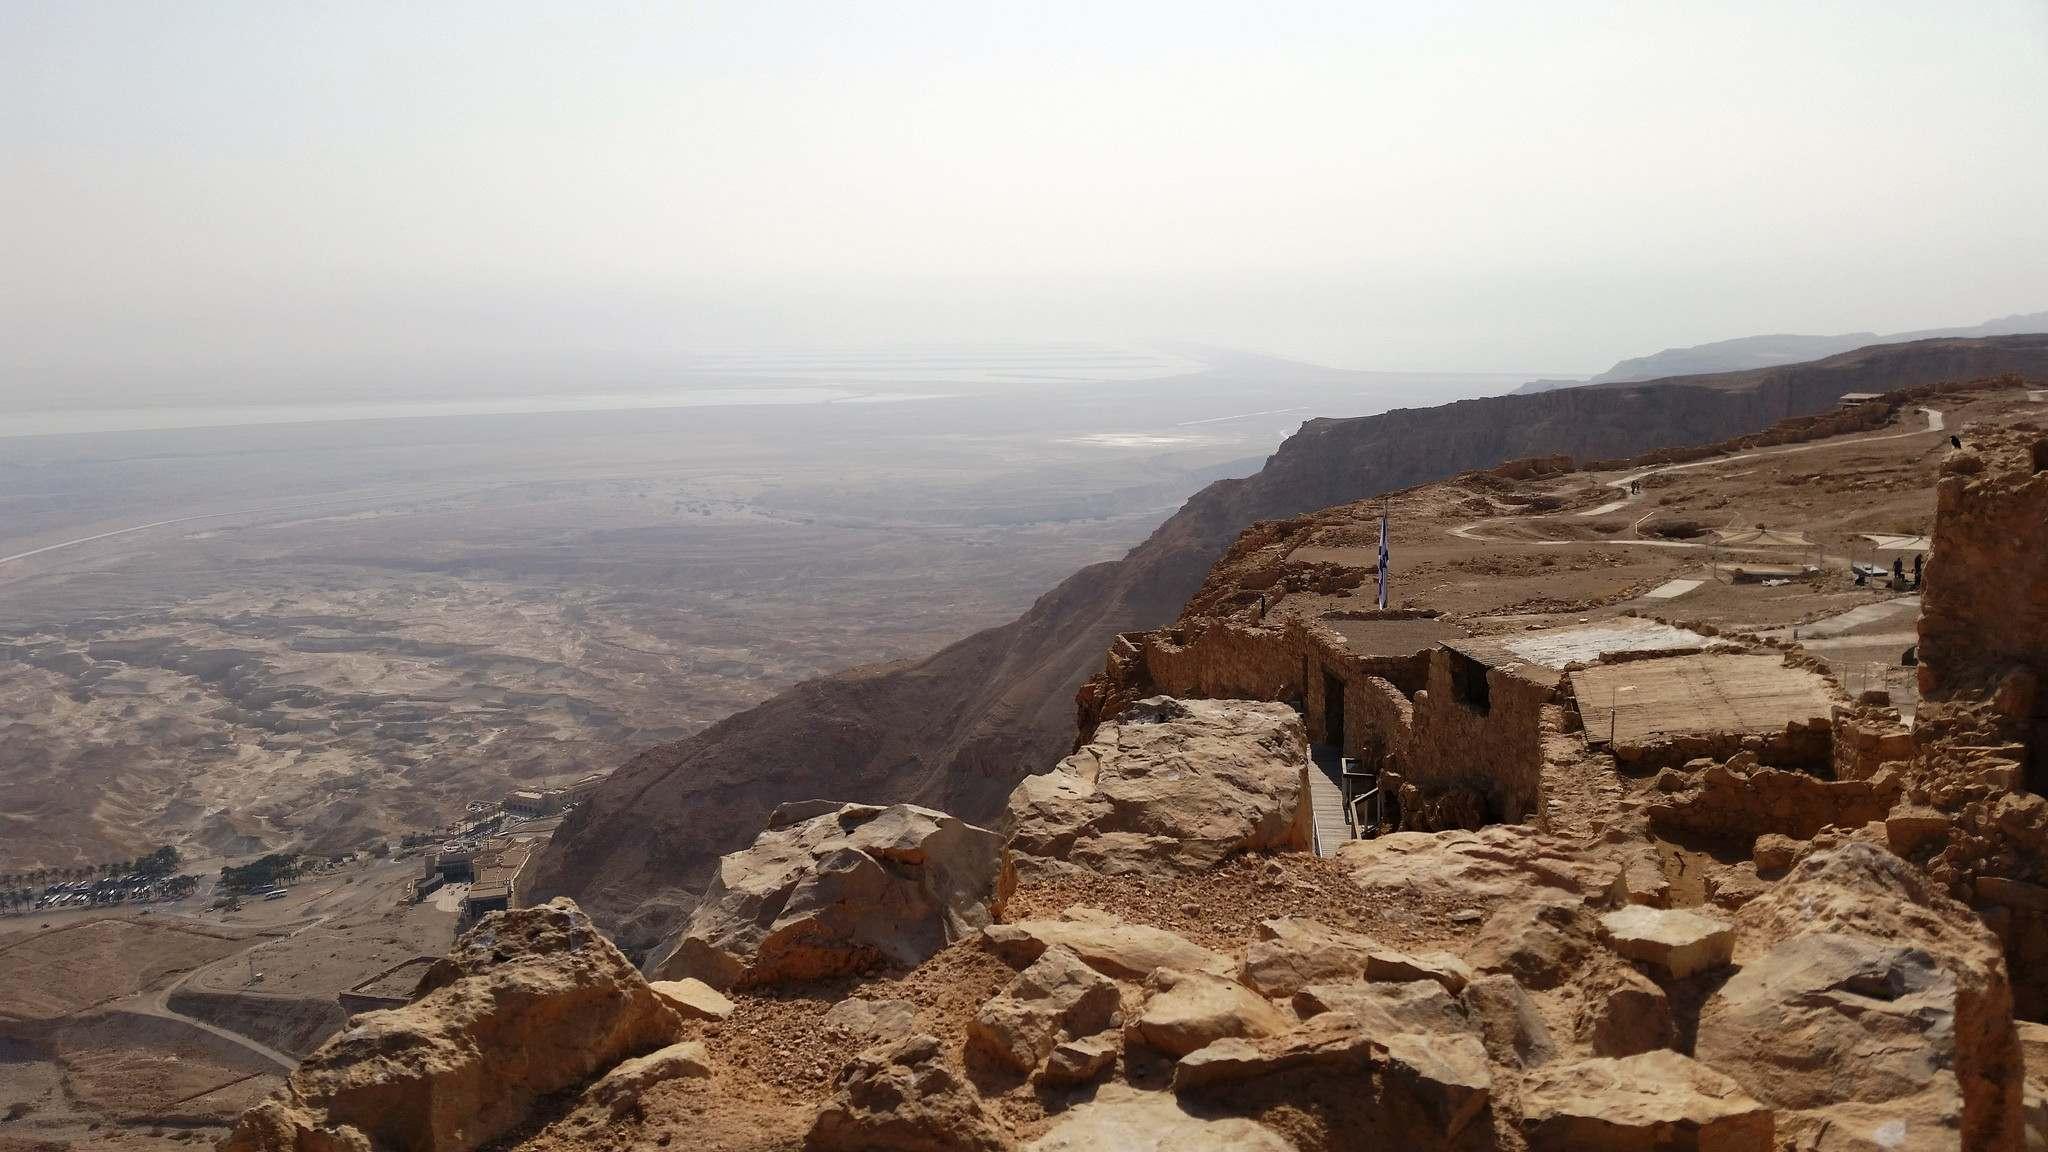 masada6 Masada Desert Fortress in Israel